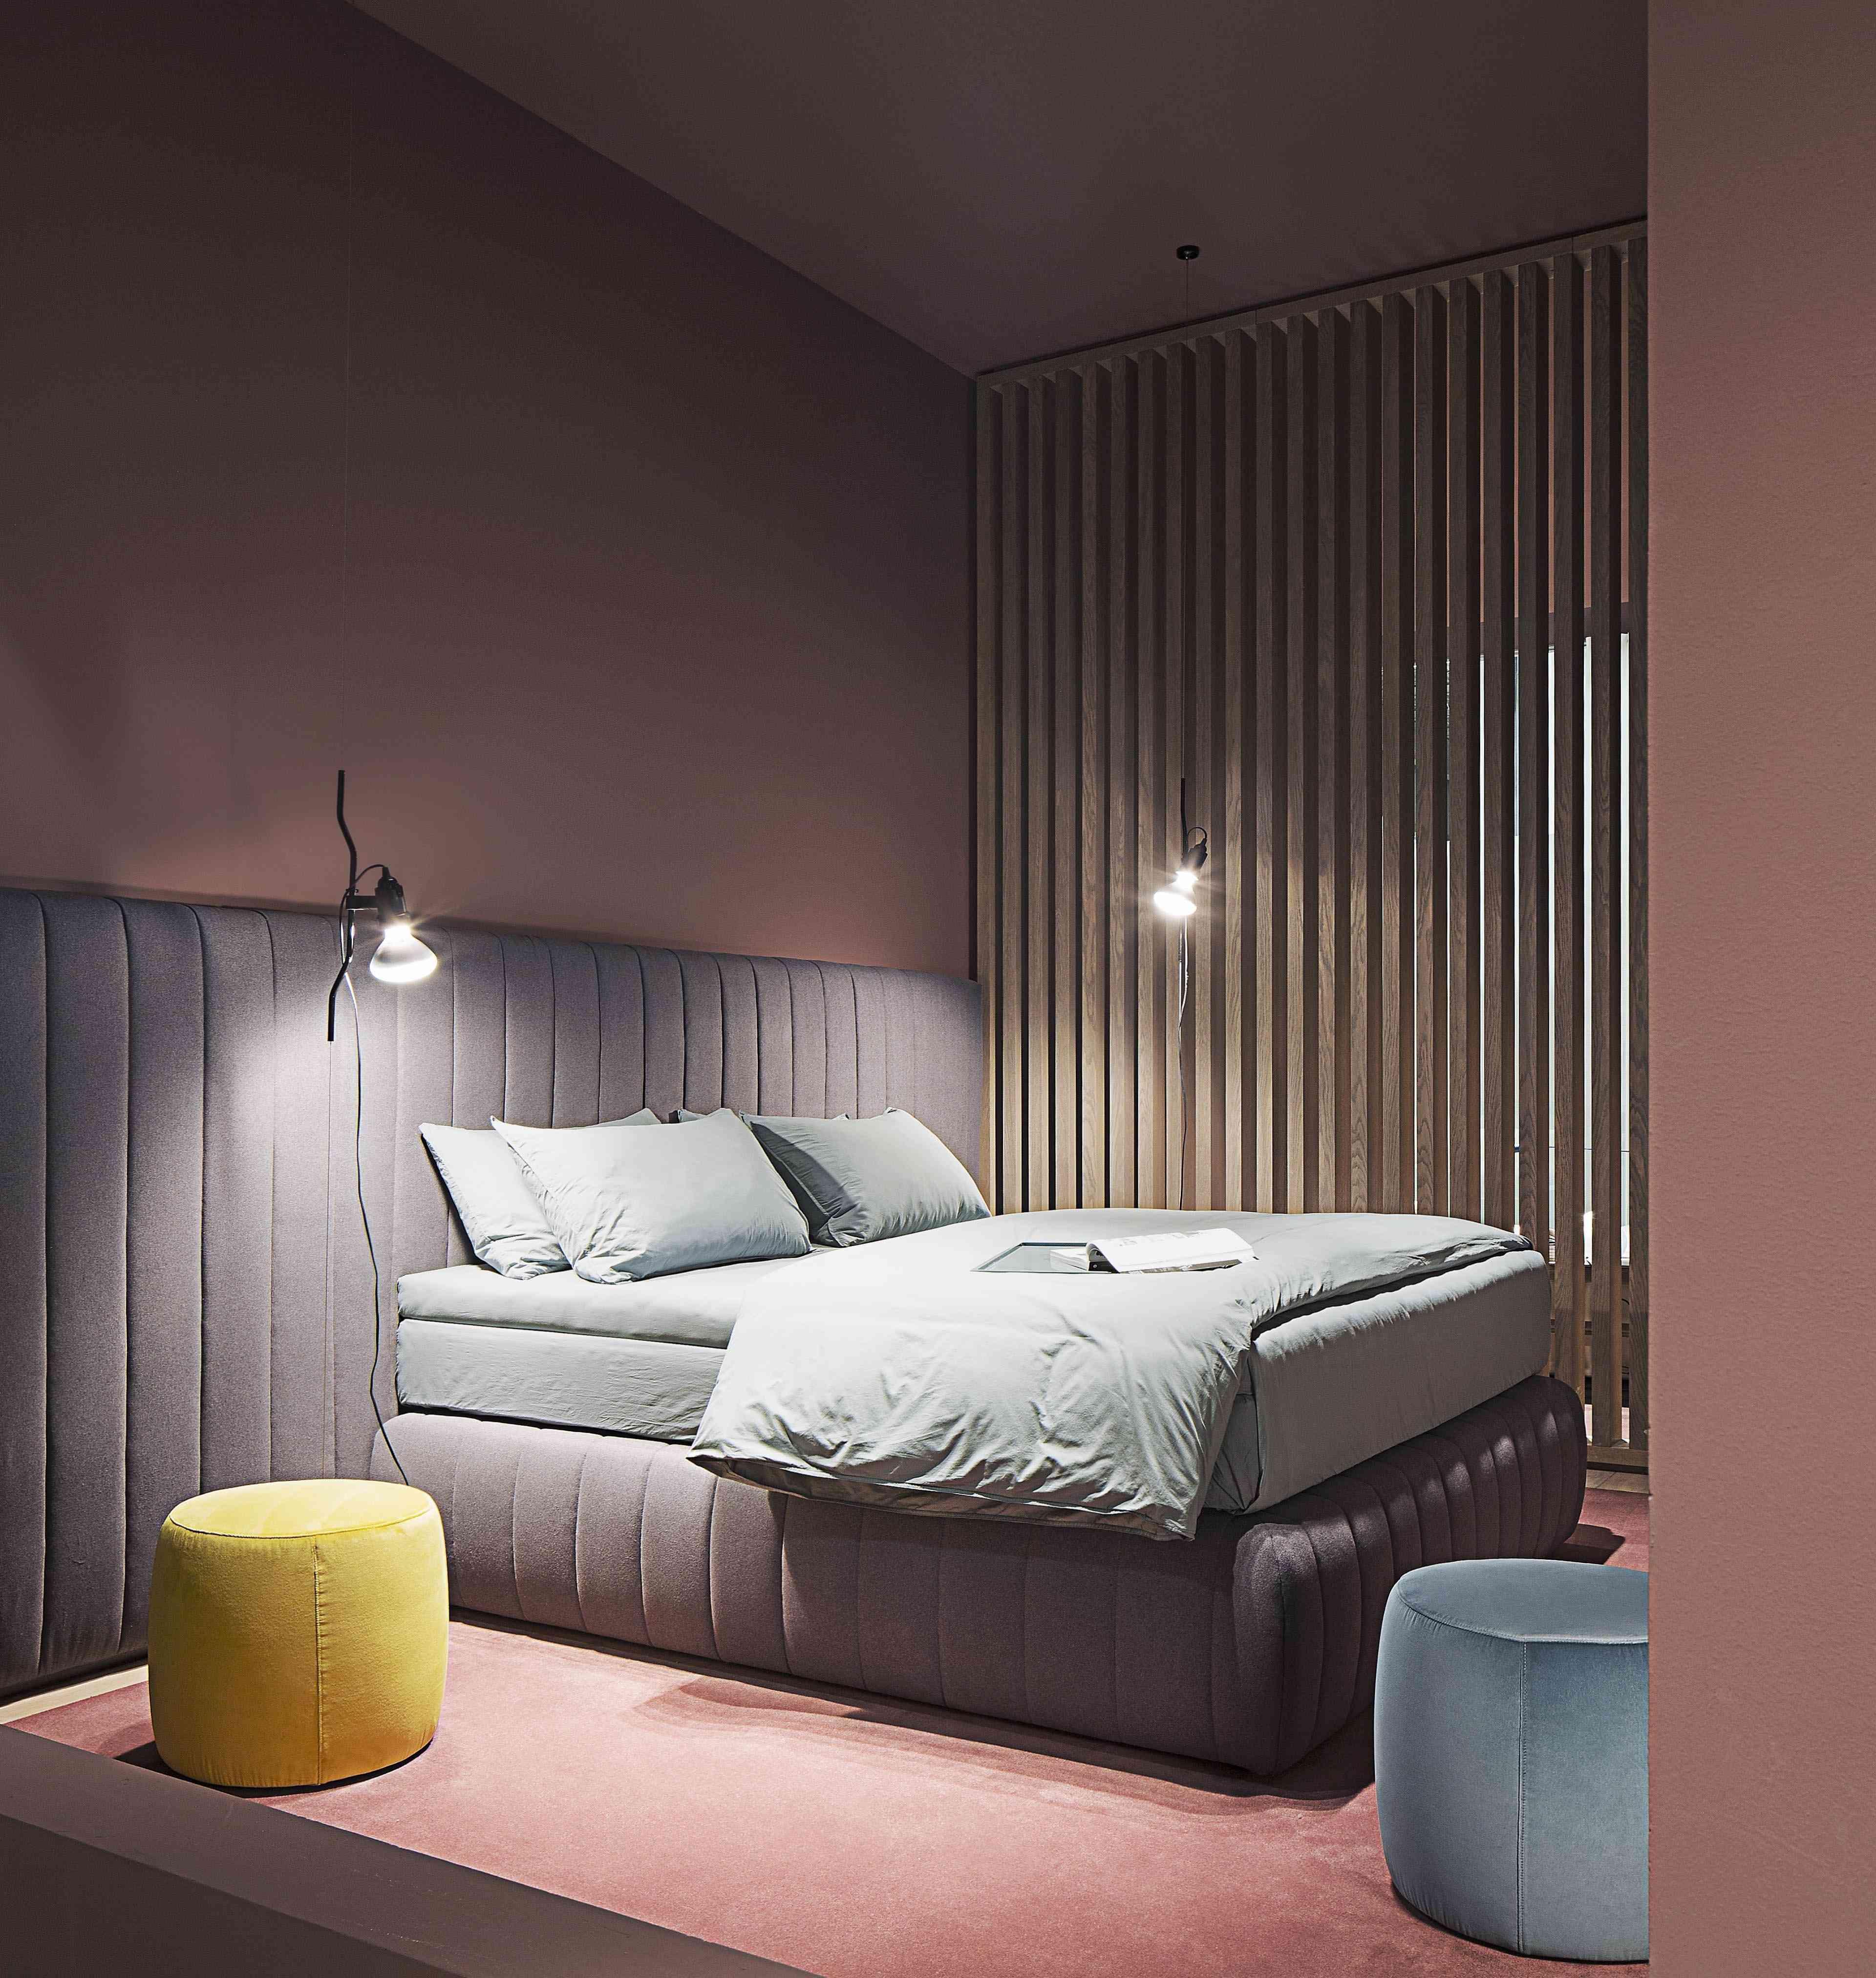 Parentesi Bedroom Pendant Lights